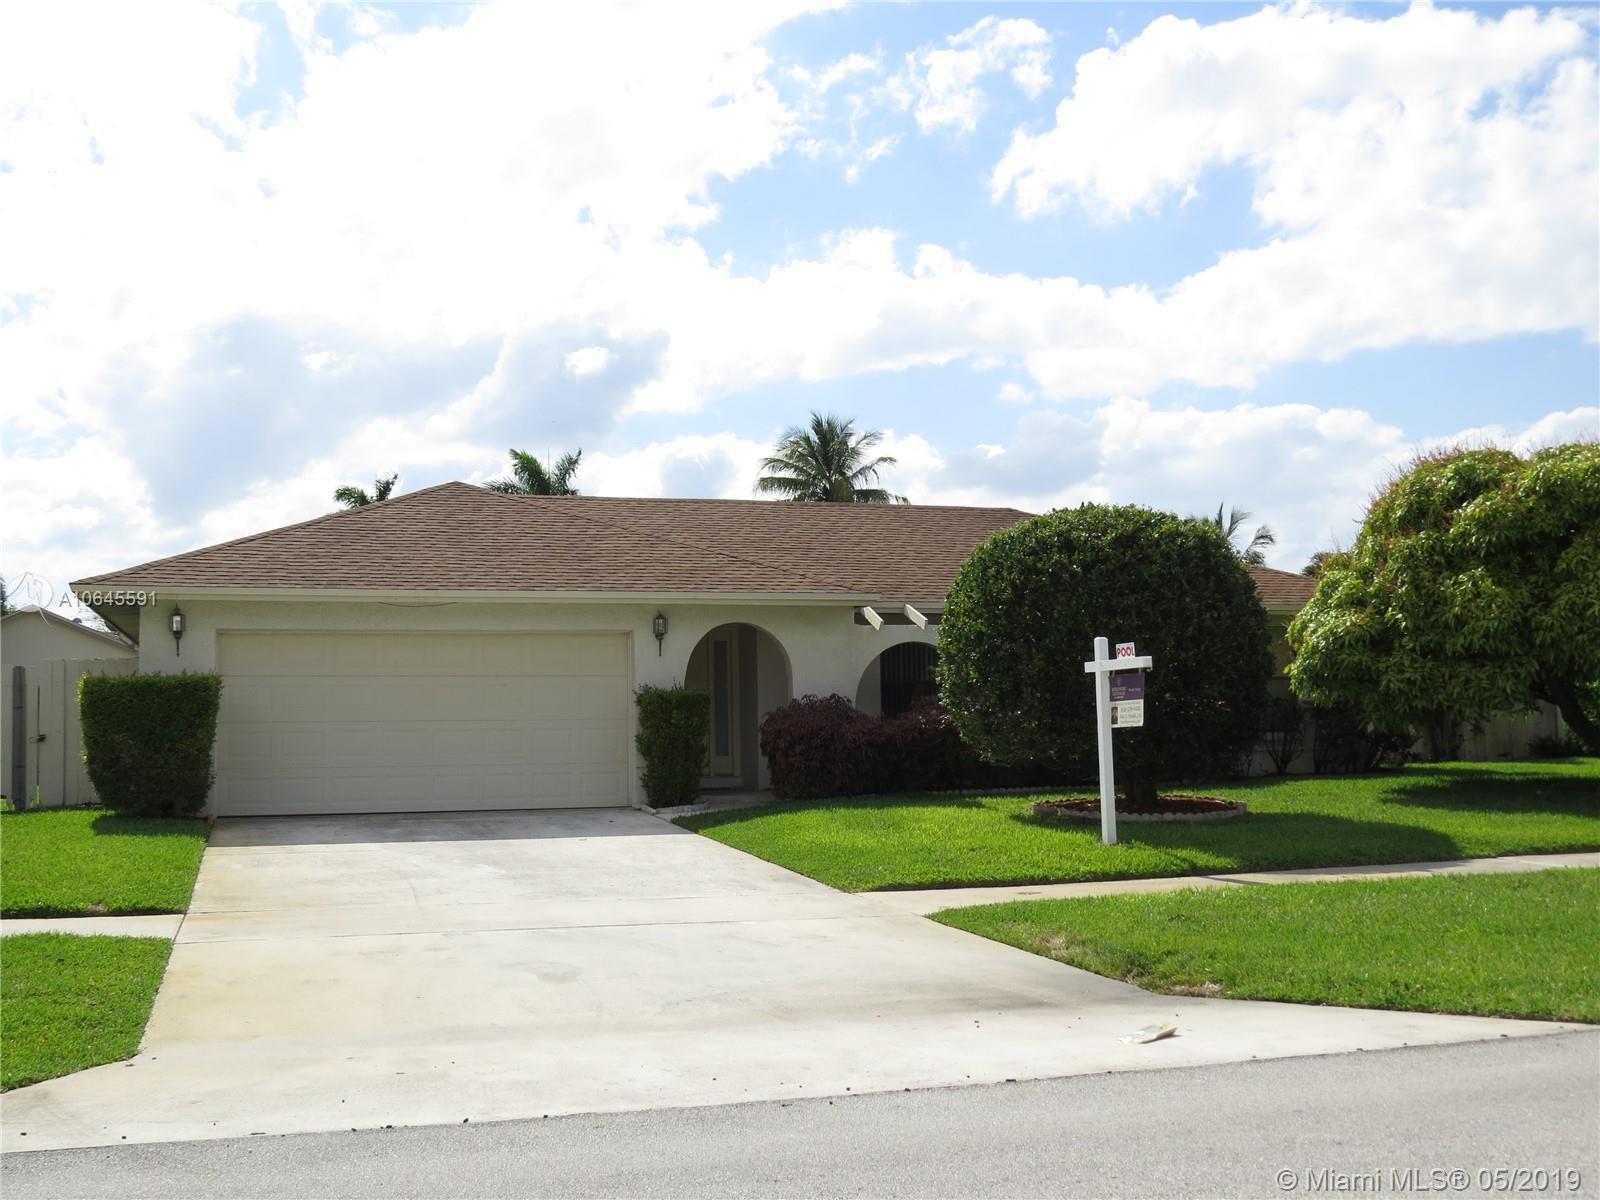 327 NW 41st Way, Deerfield Beach, FL 33442